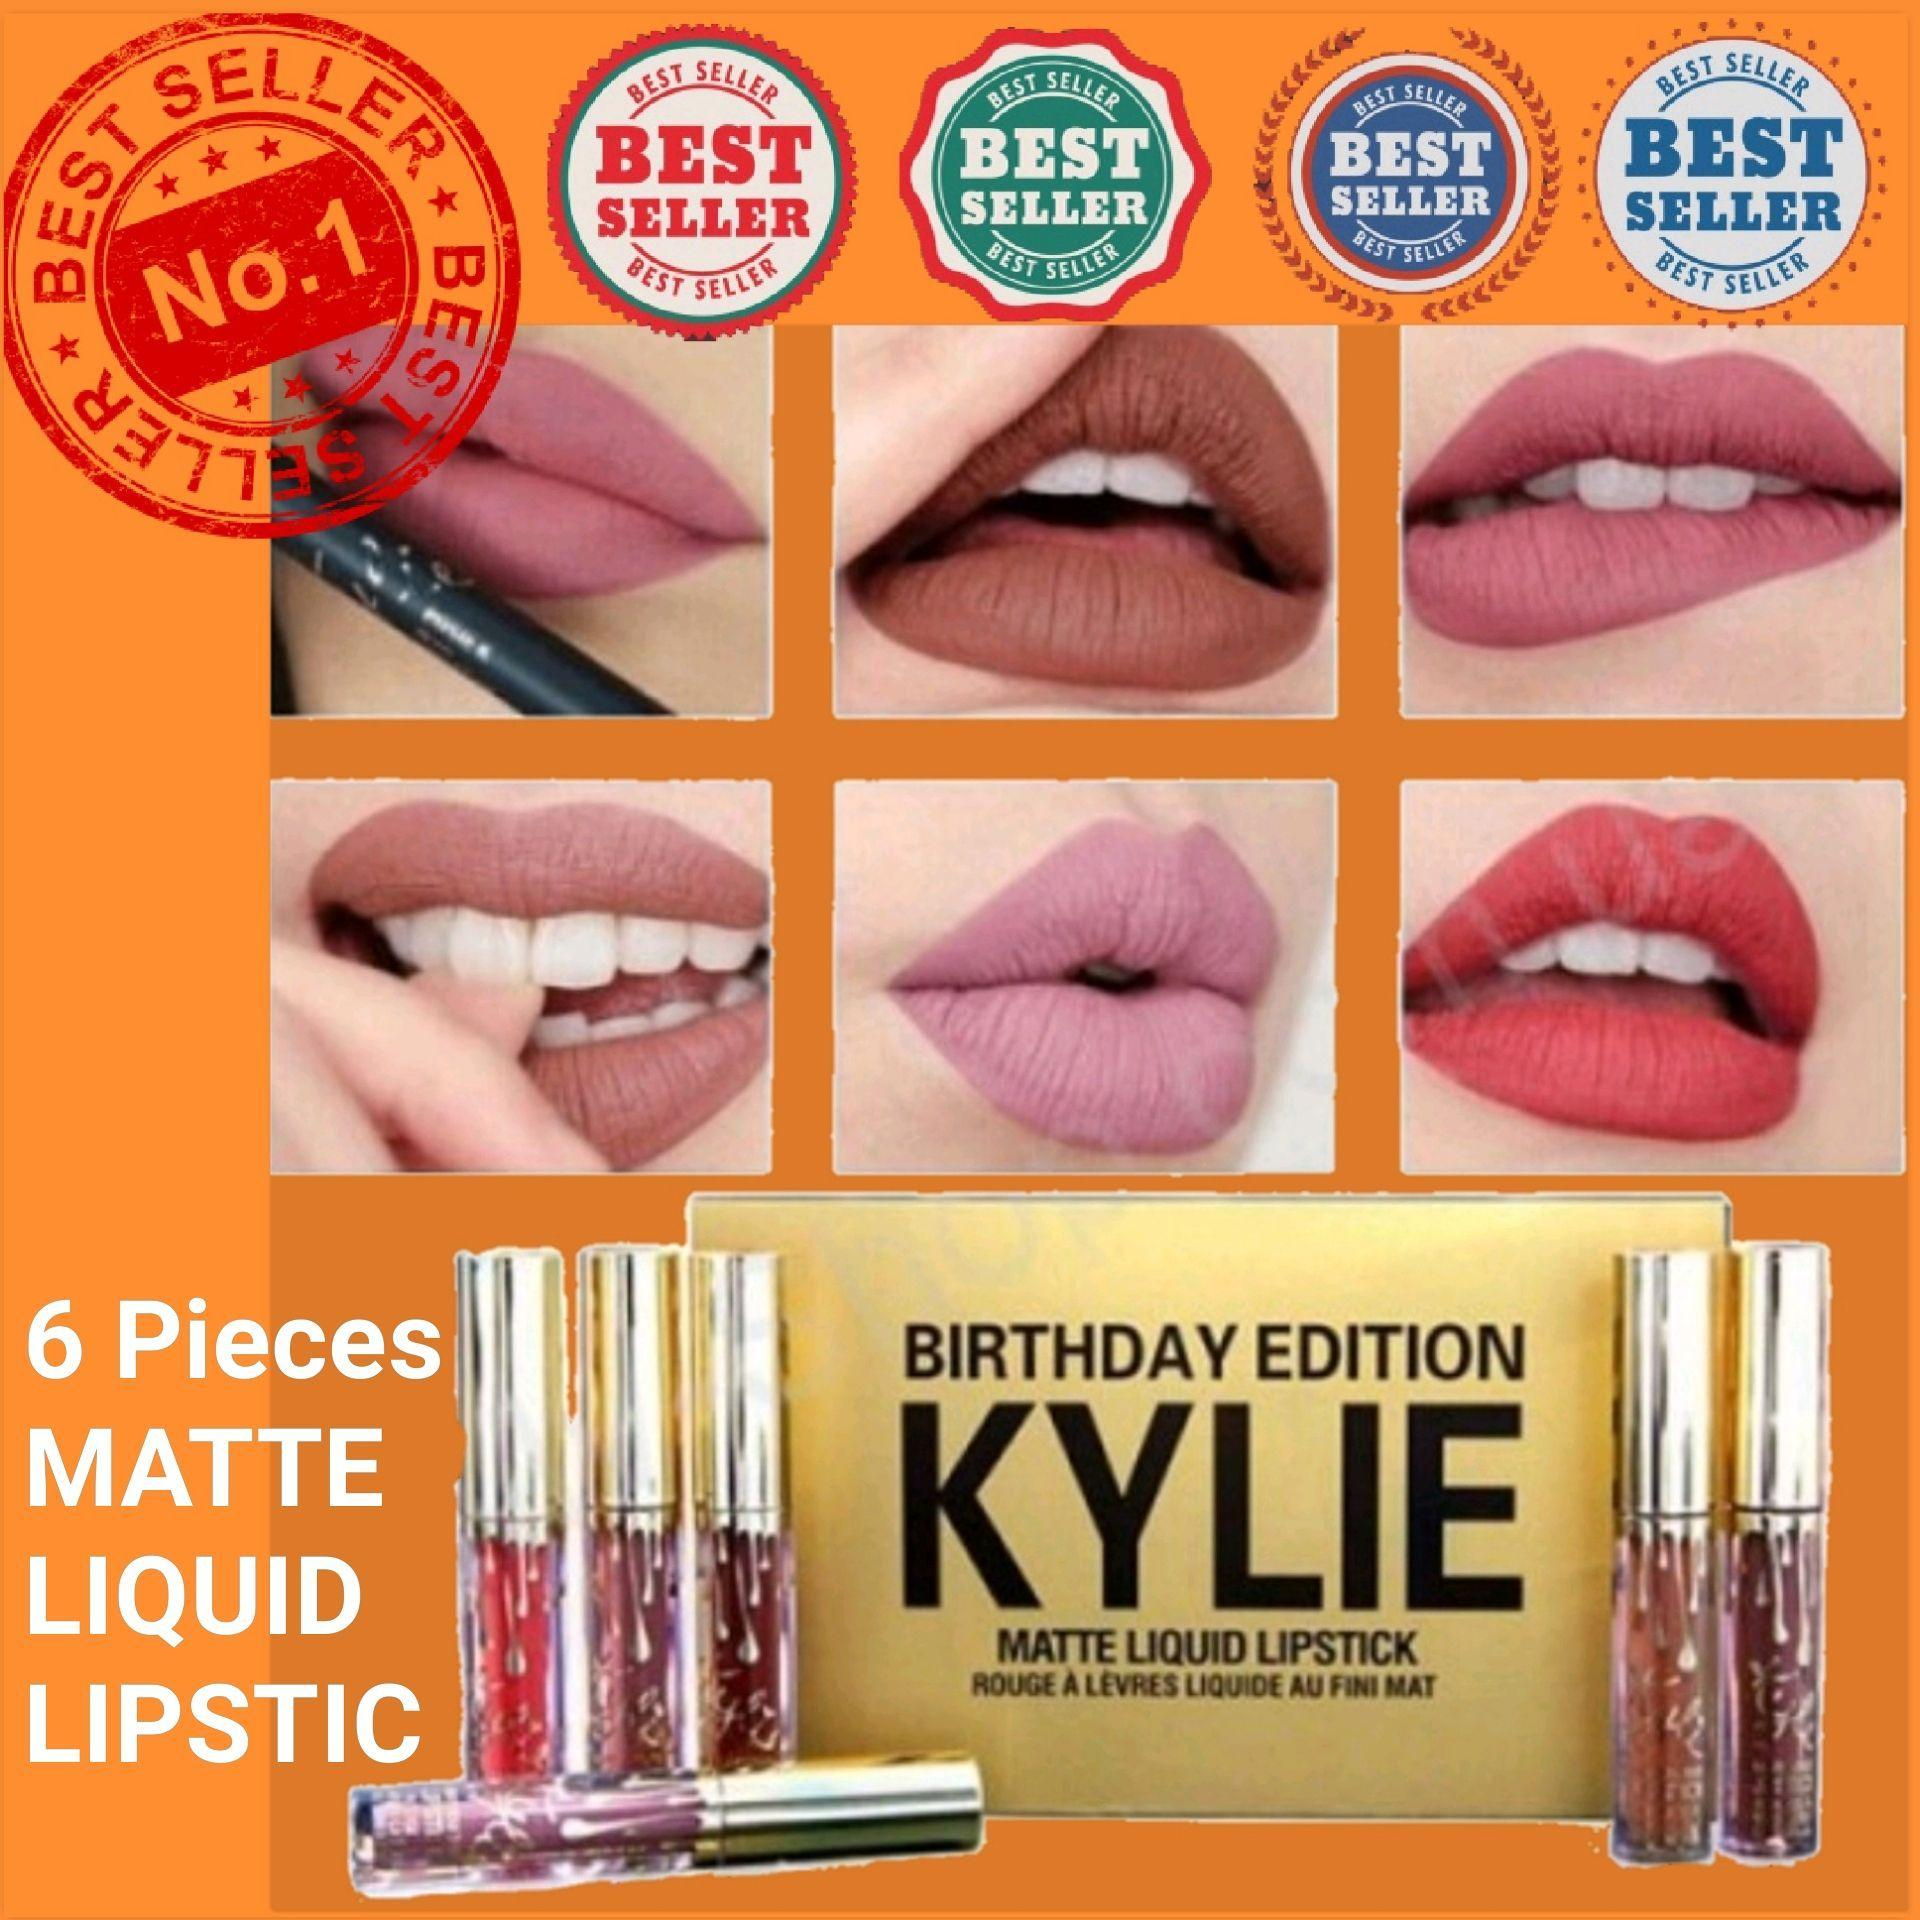 6 pcs Kylie Matte Liquid Lipstick Philippines